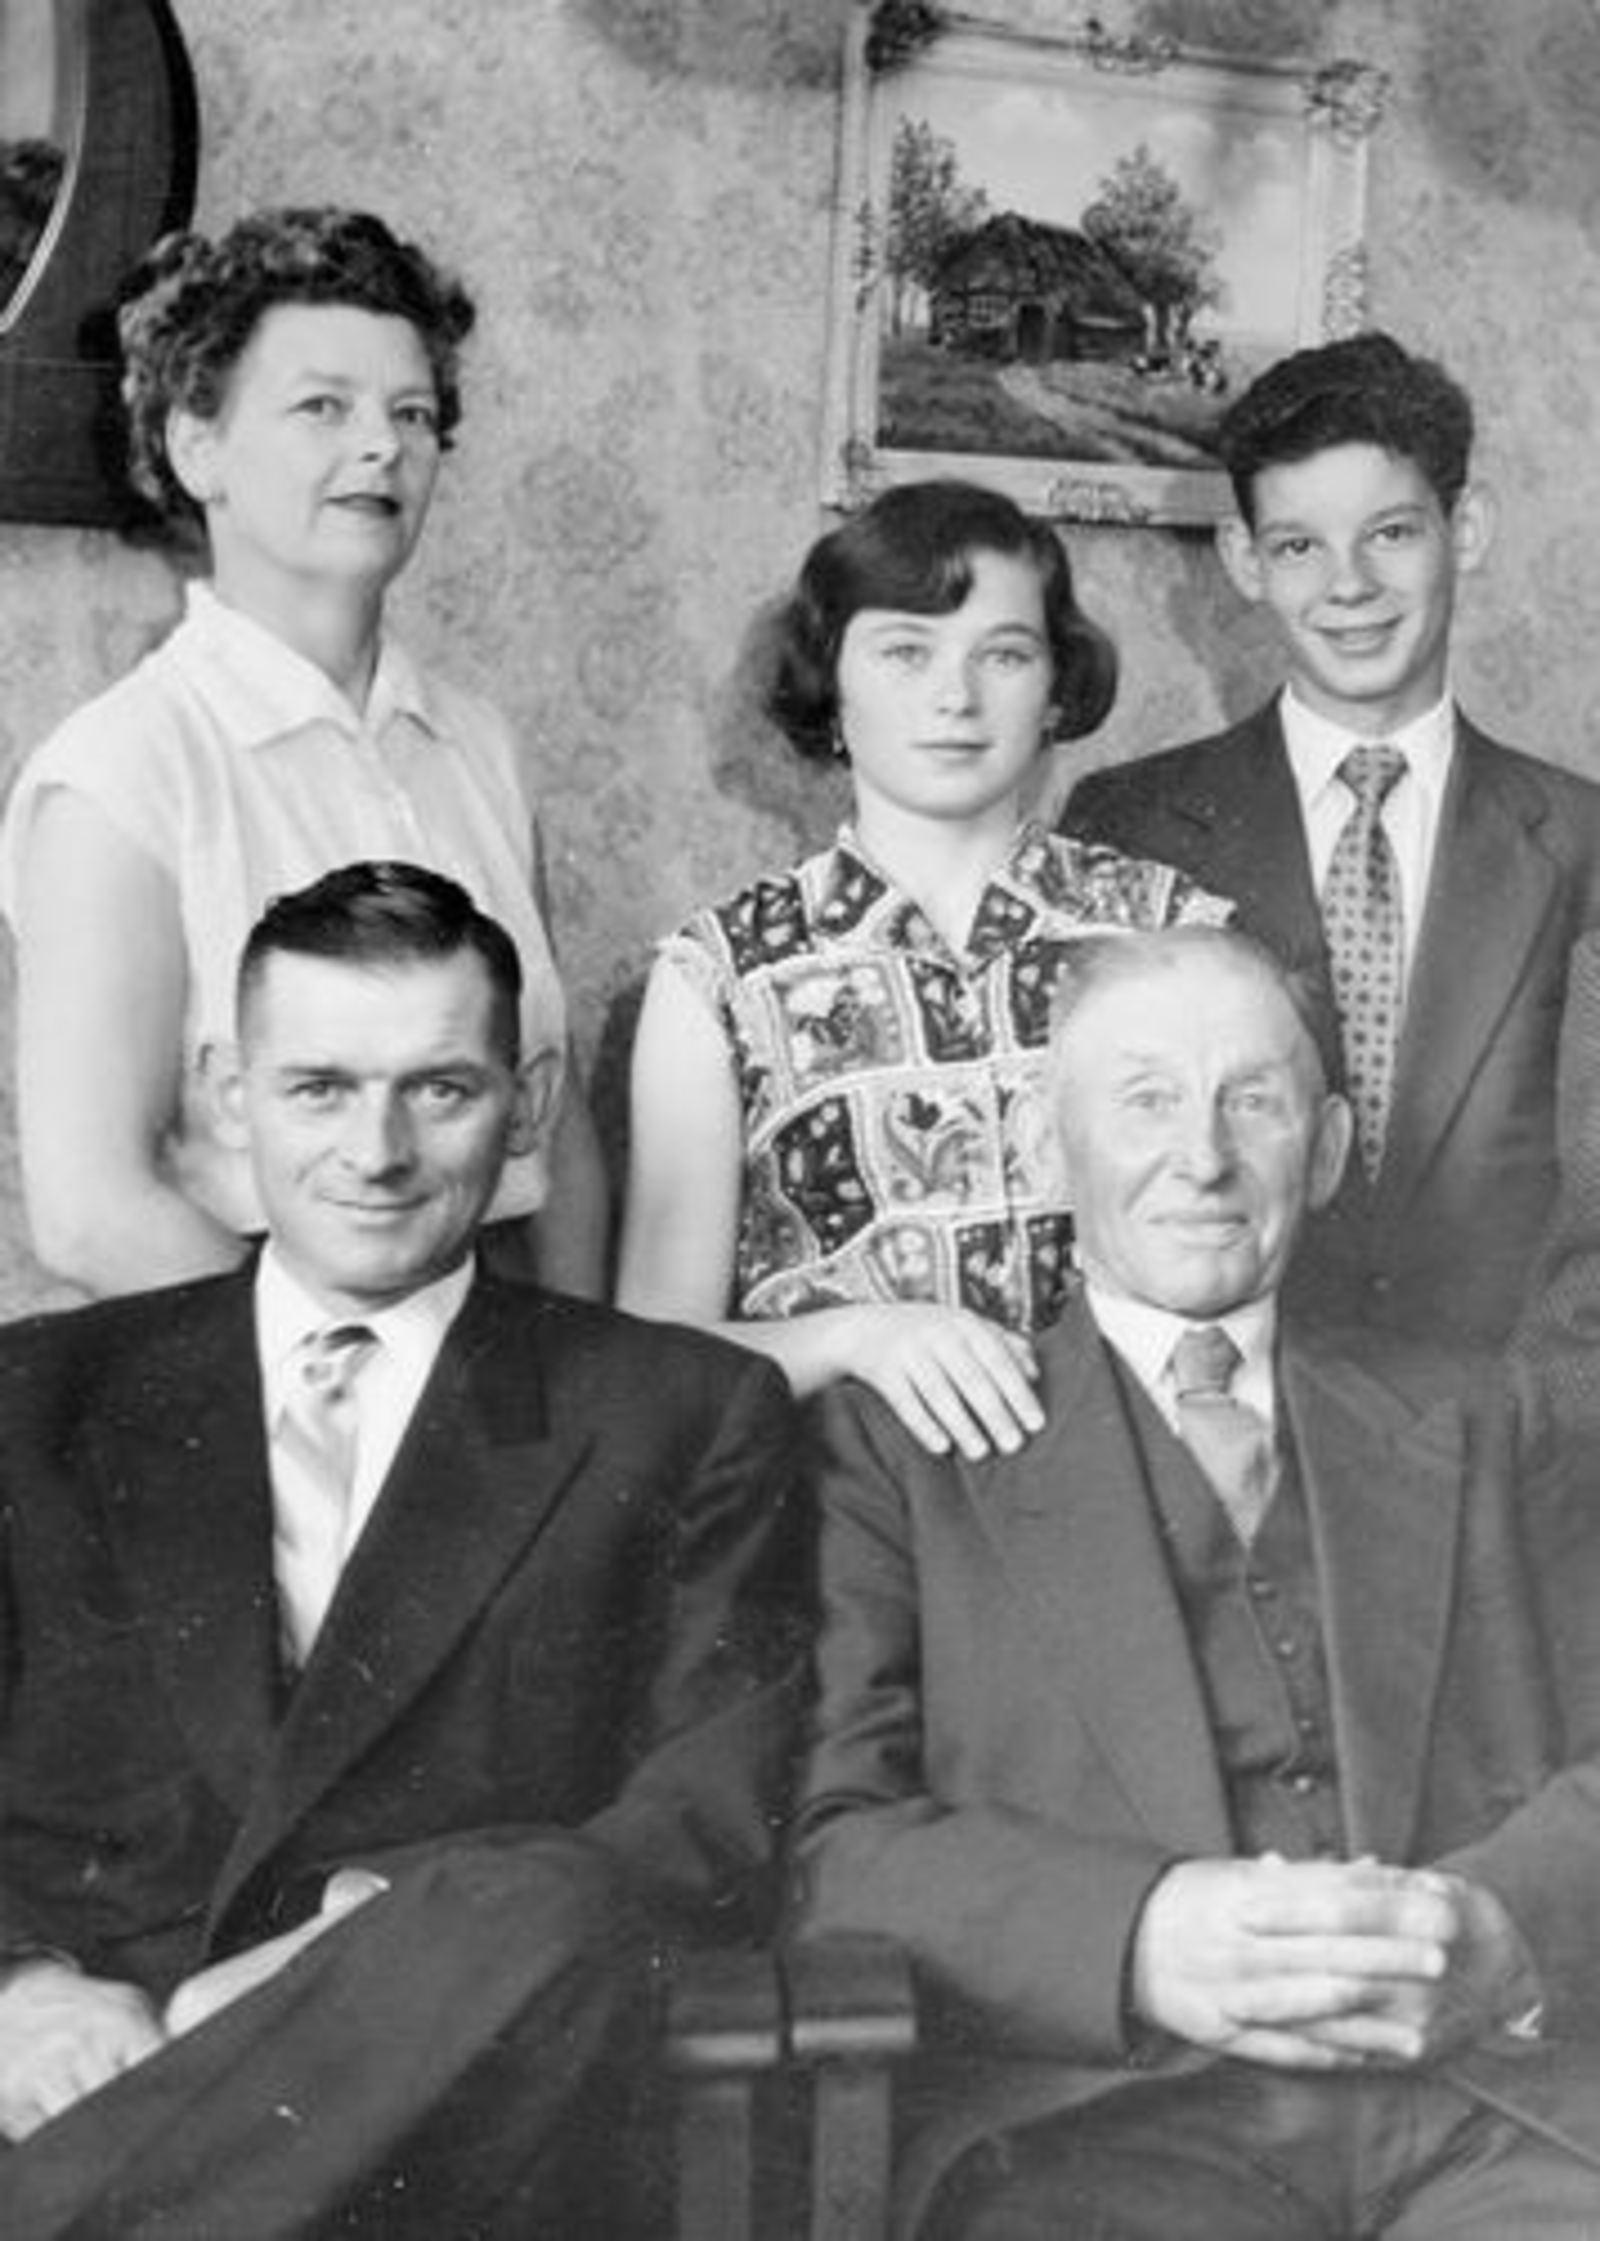 Koolbergen Fons 1914 1956± Gezinsfoto met Opa Stiekema